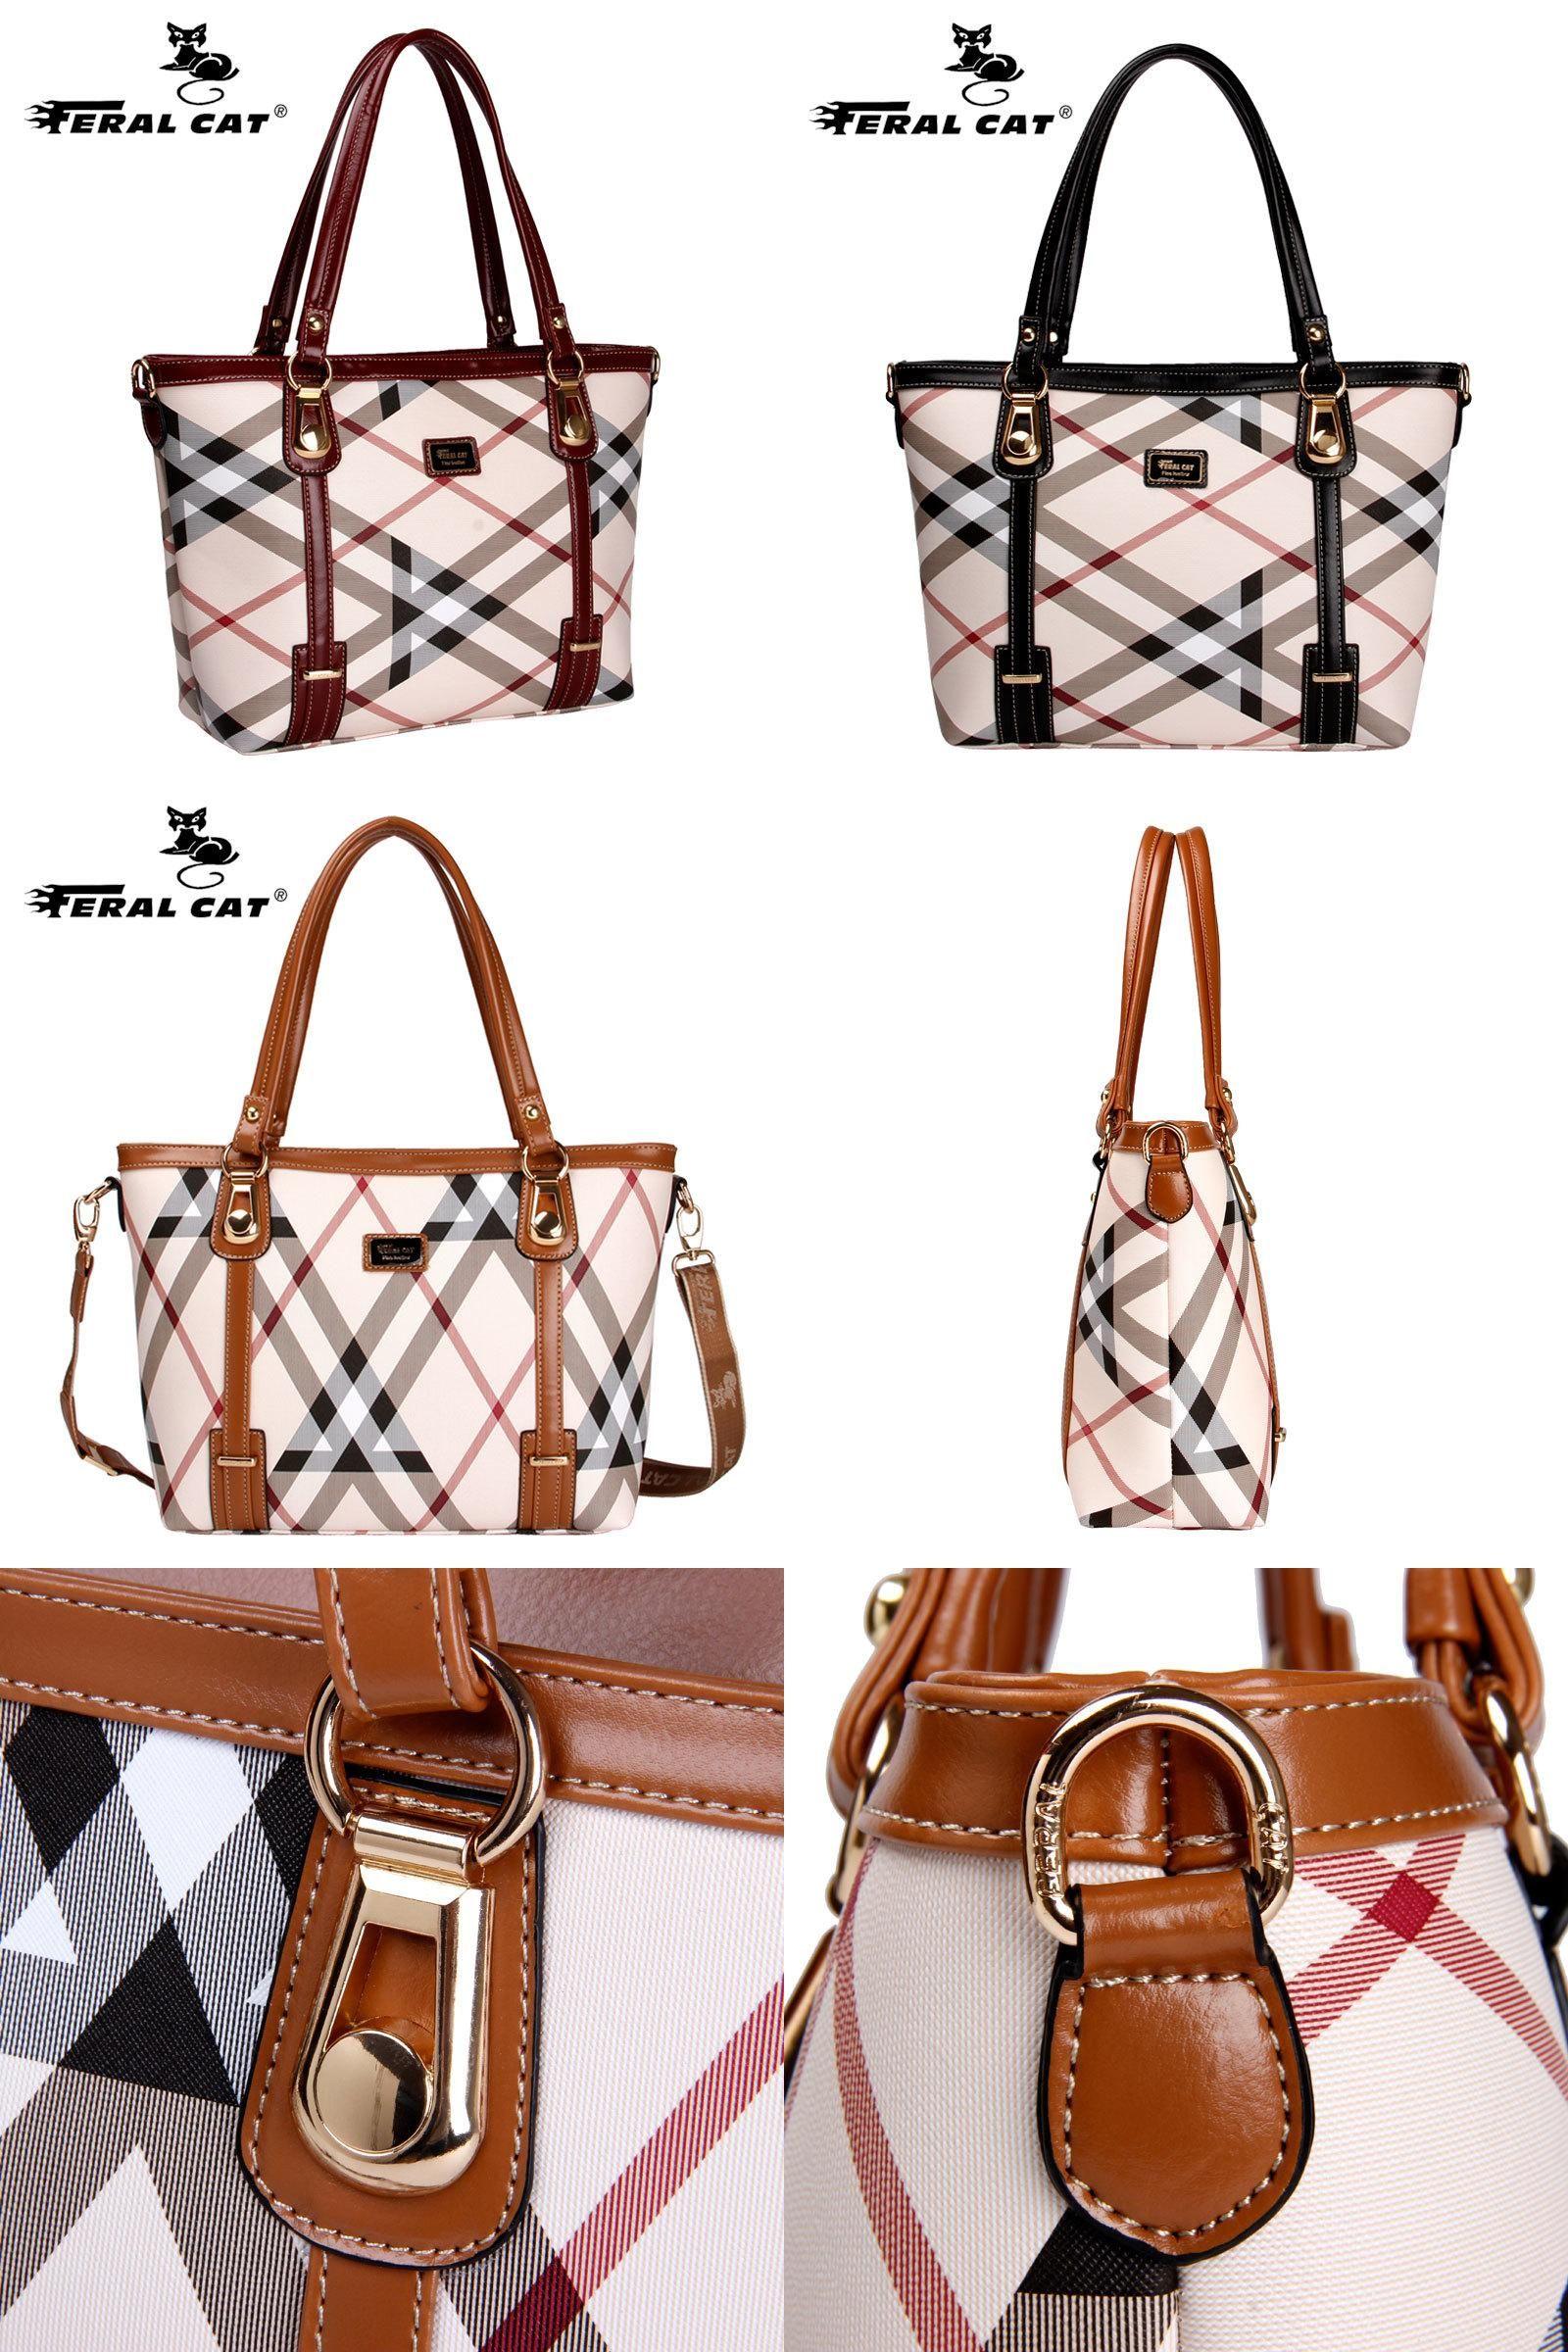 93b493744e9 Visit to Buy] FERAL CAT Women Tote Bag New Designer Handbags Luxury ...